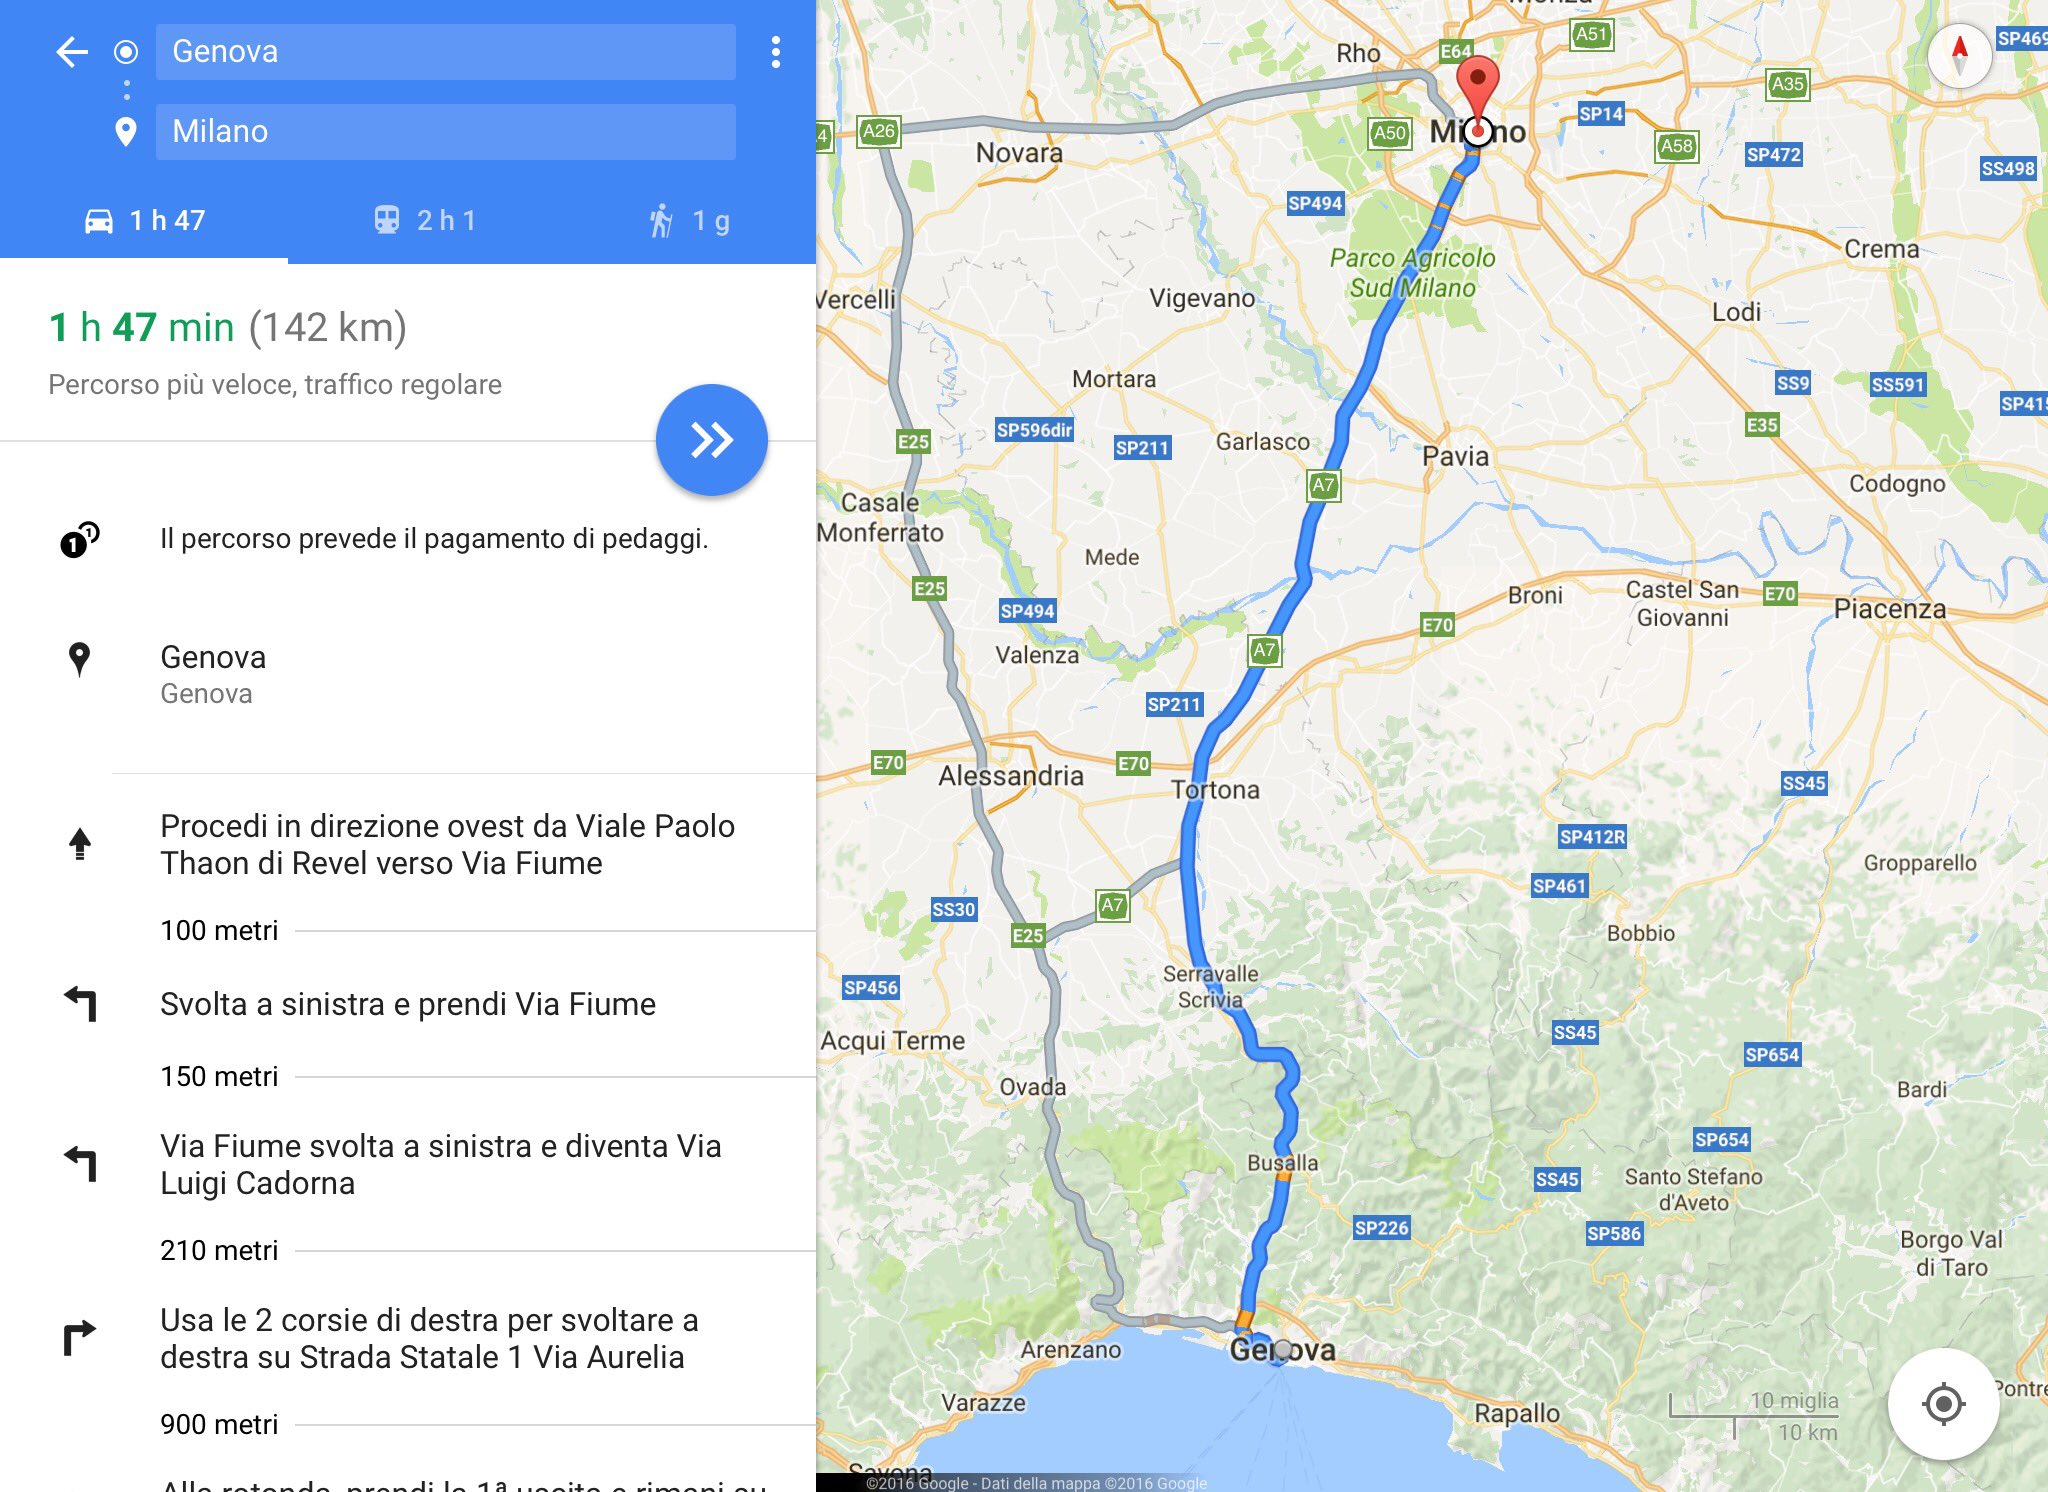 calcolare distanza km google maps help tecno blog. Black Bedroom Furniture Sets. Home Design Ideas